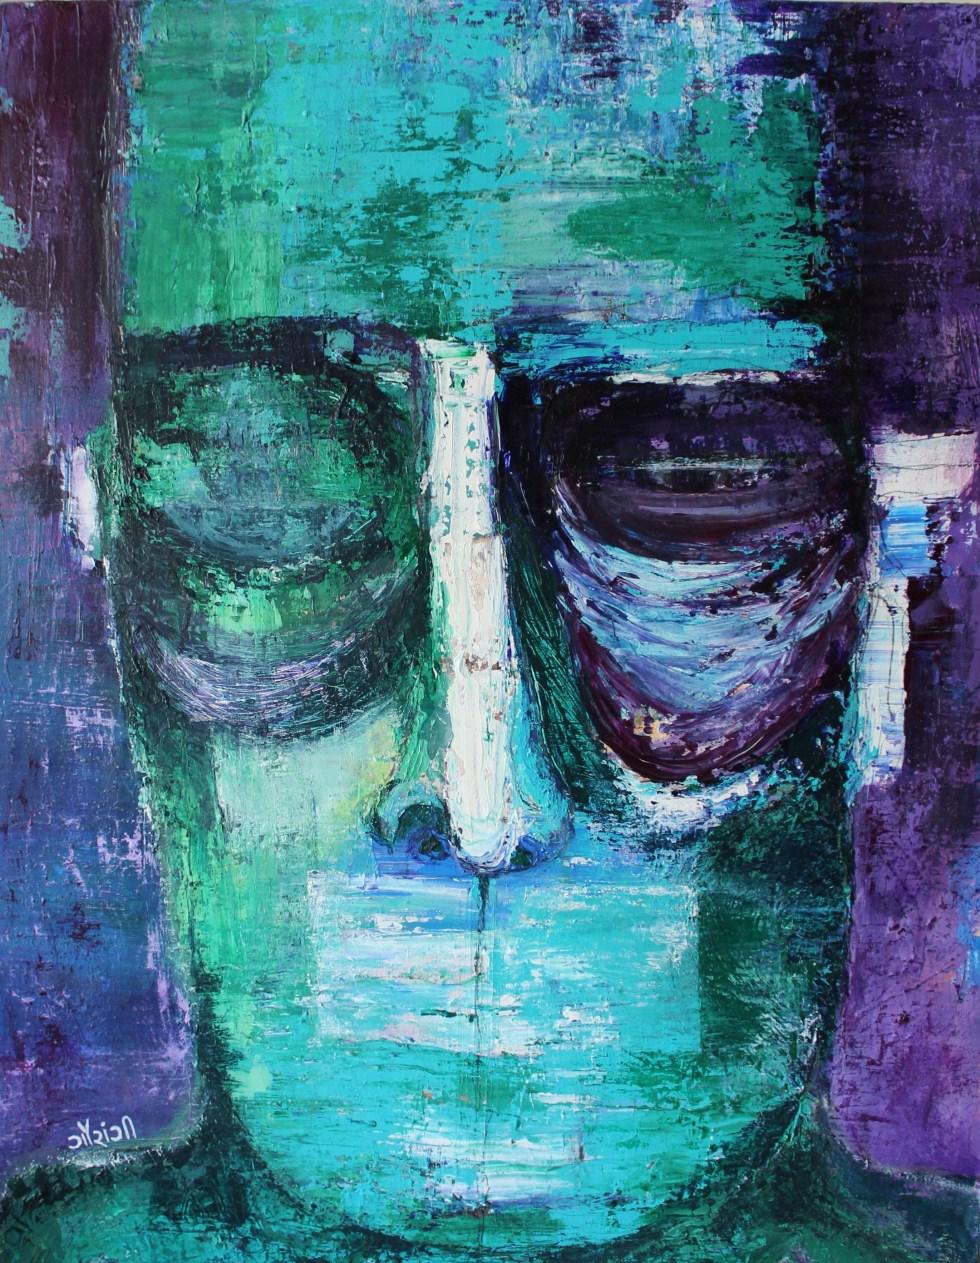 Title: Ambiguity Medium: Acrylic on canvas Size: 24*22 inches (2019) Artist: gaurangi mehta shah